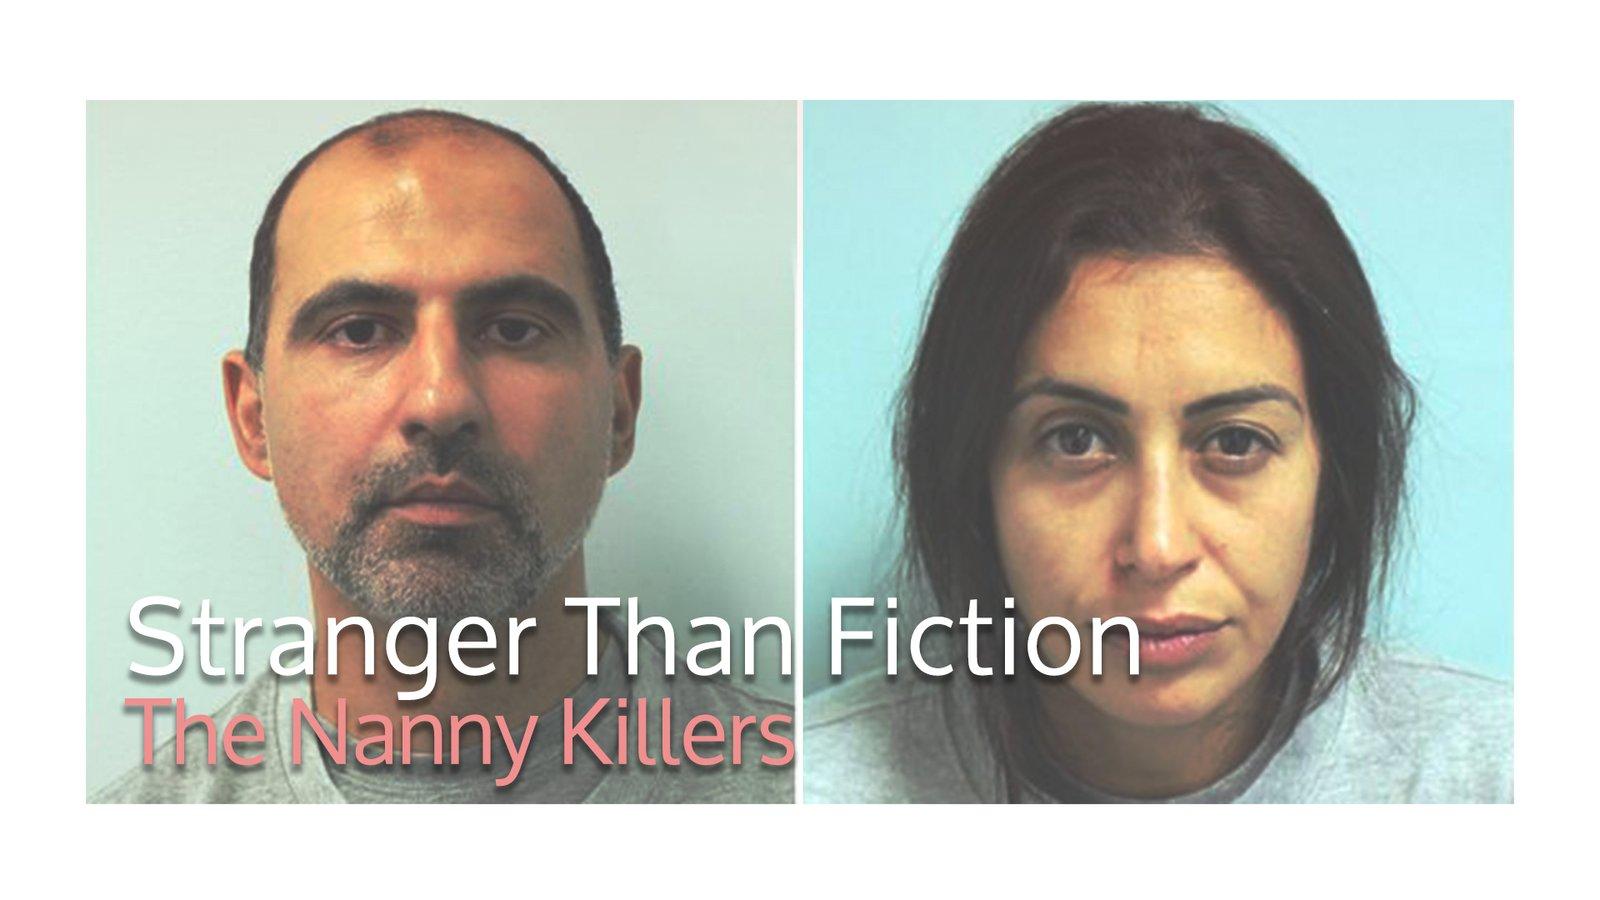 Stranger than Fiction: The Nanny Killer - N.A